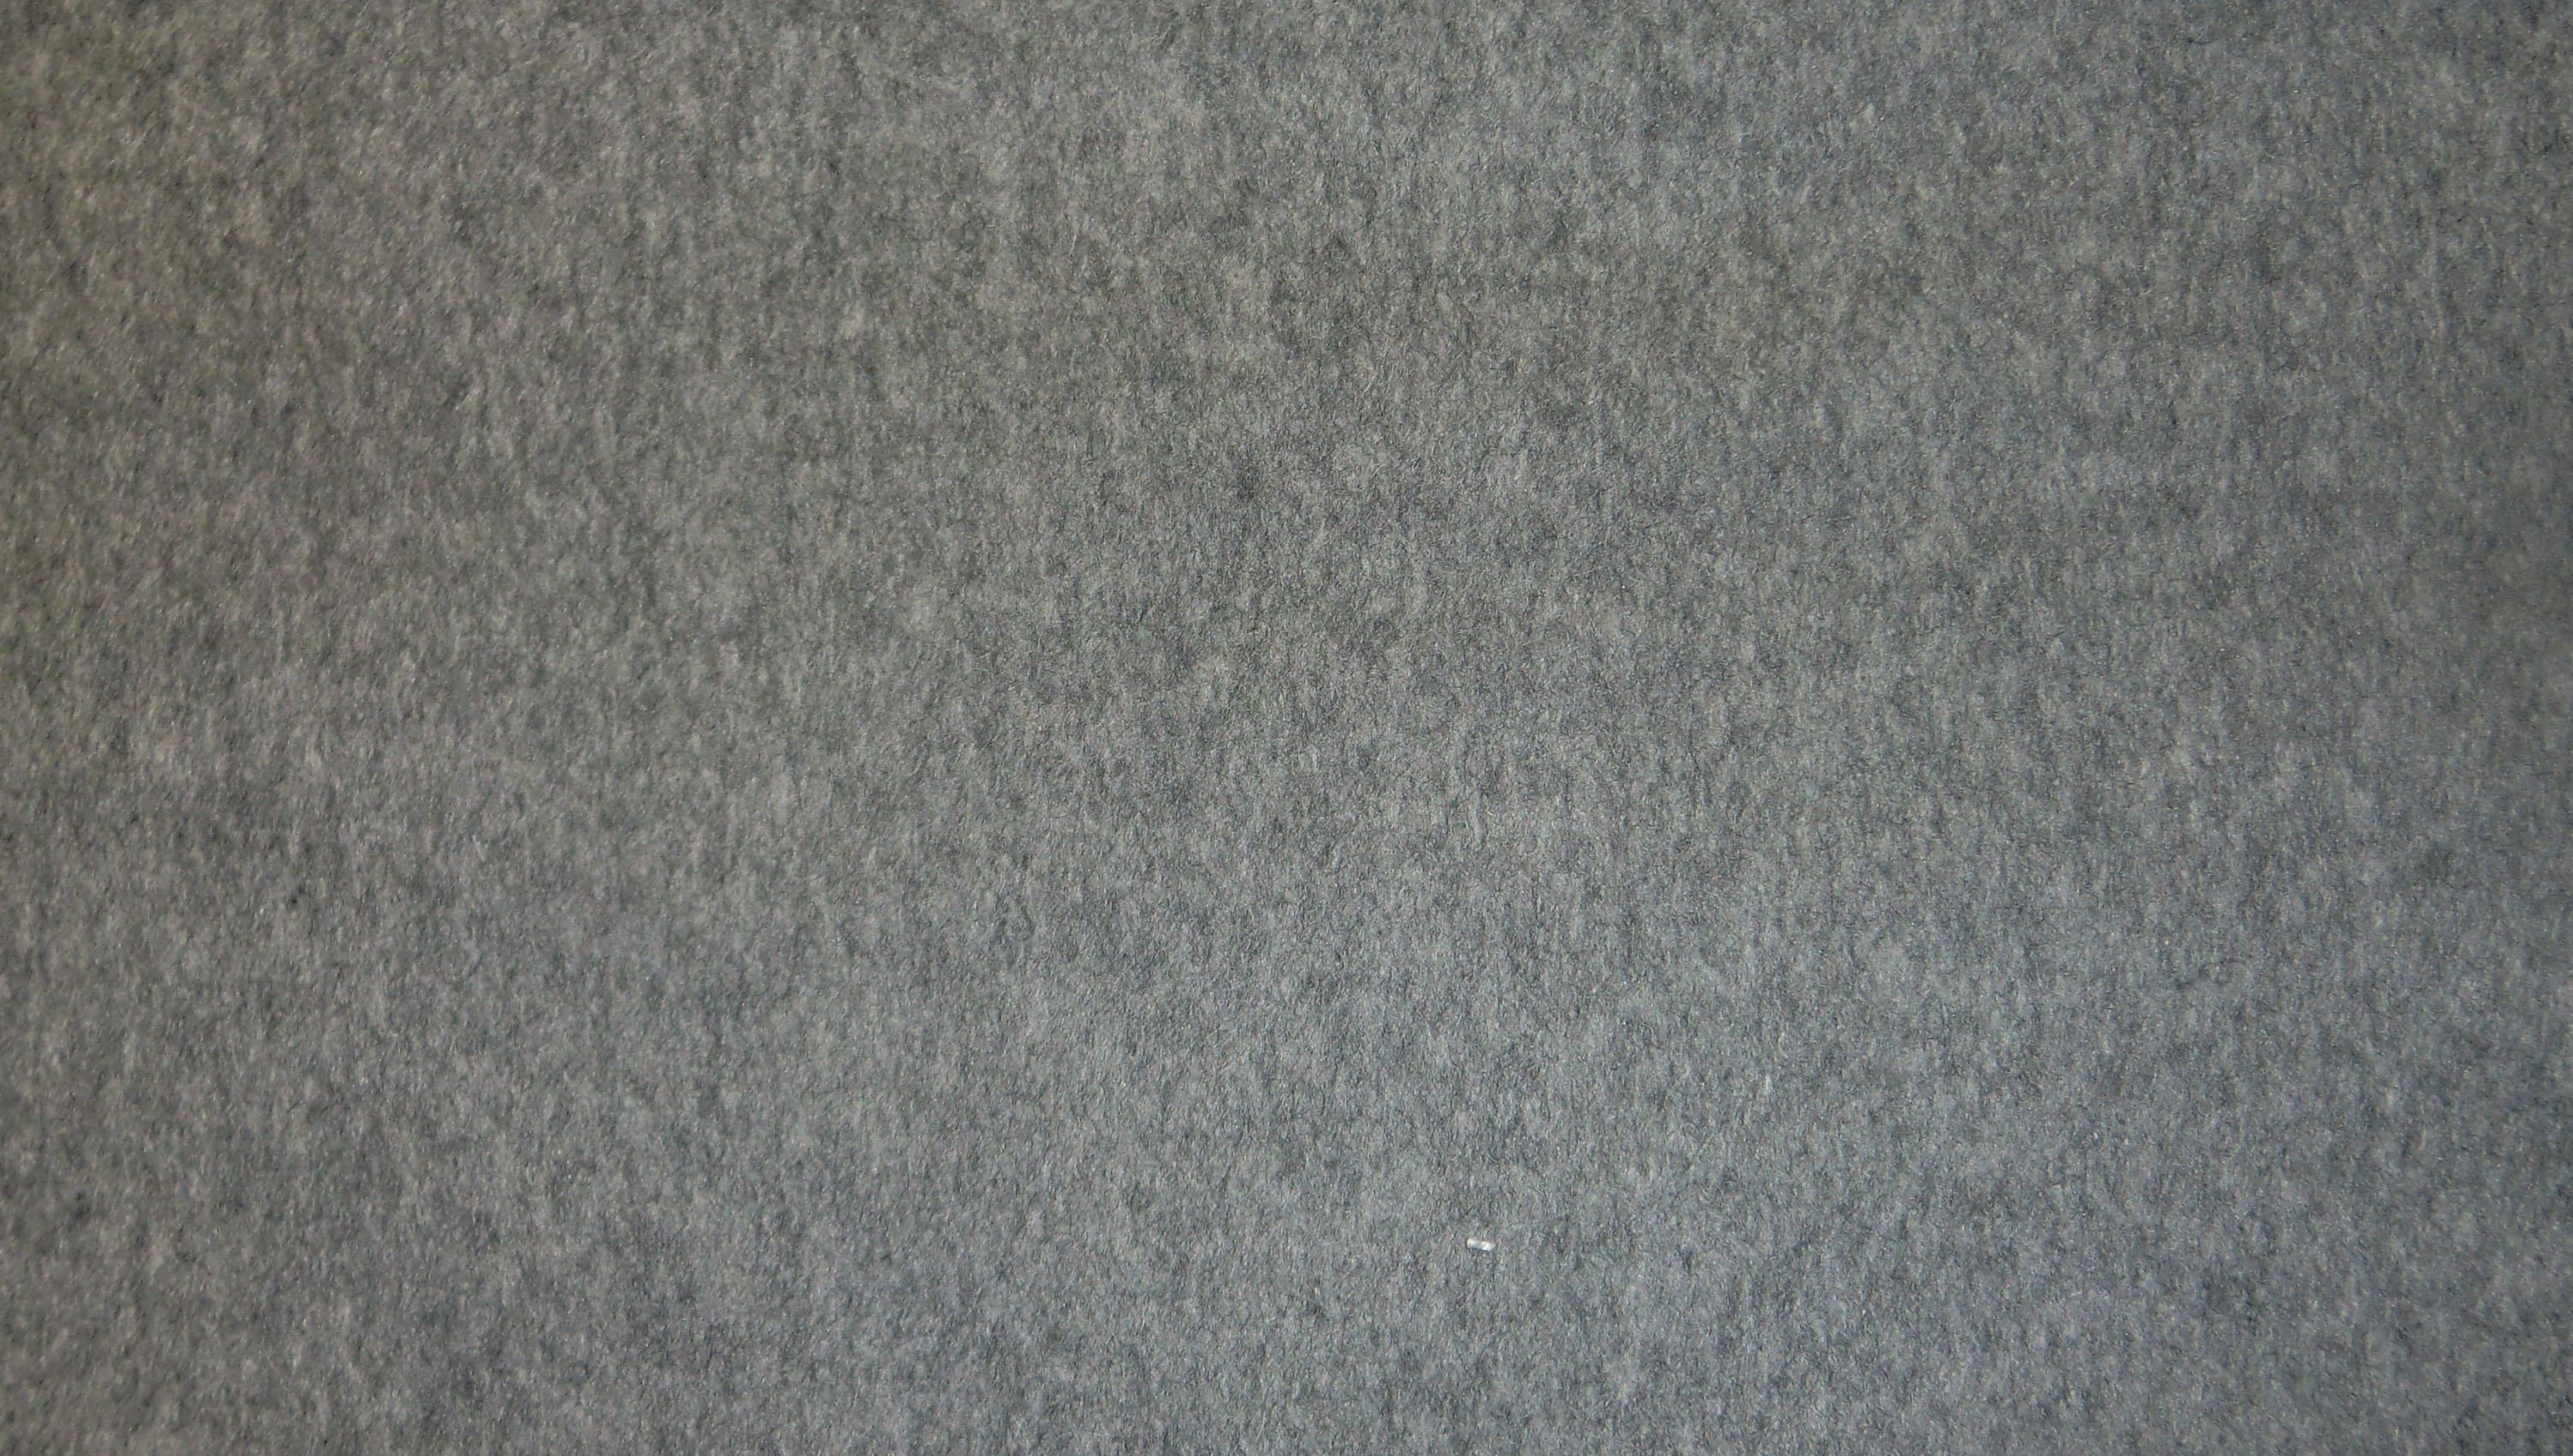 Ralph Lauren Fabrics Burke Wool Plain Heather